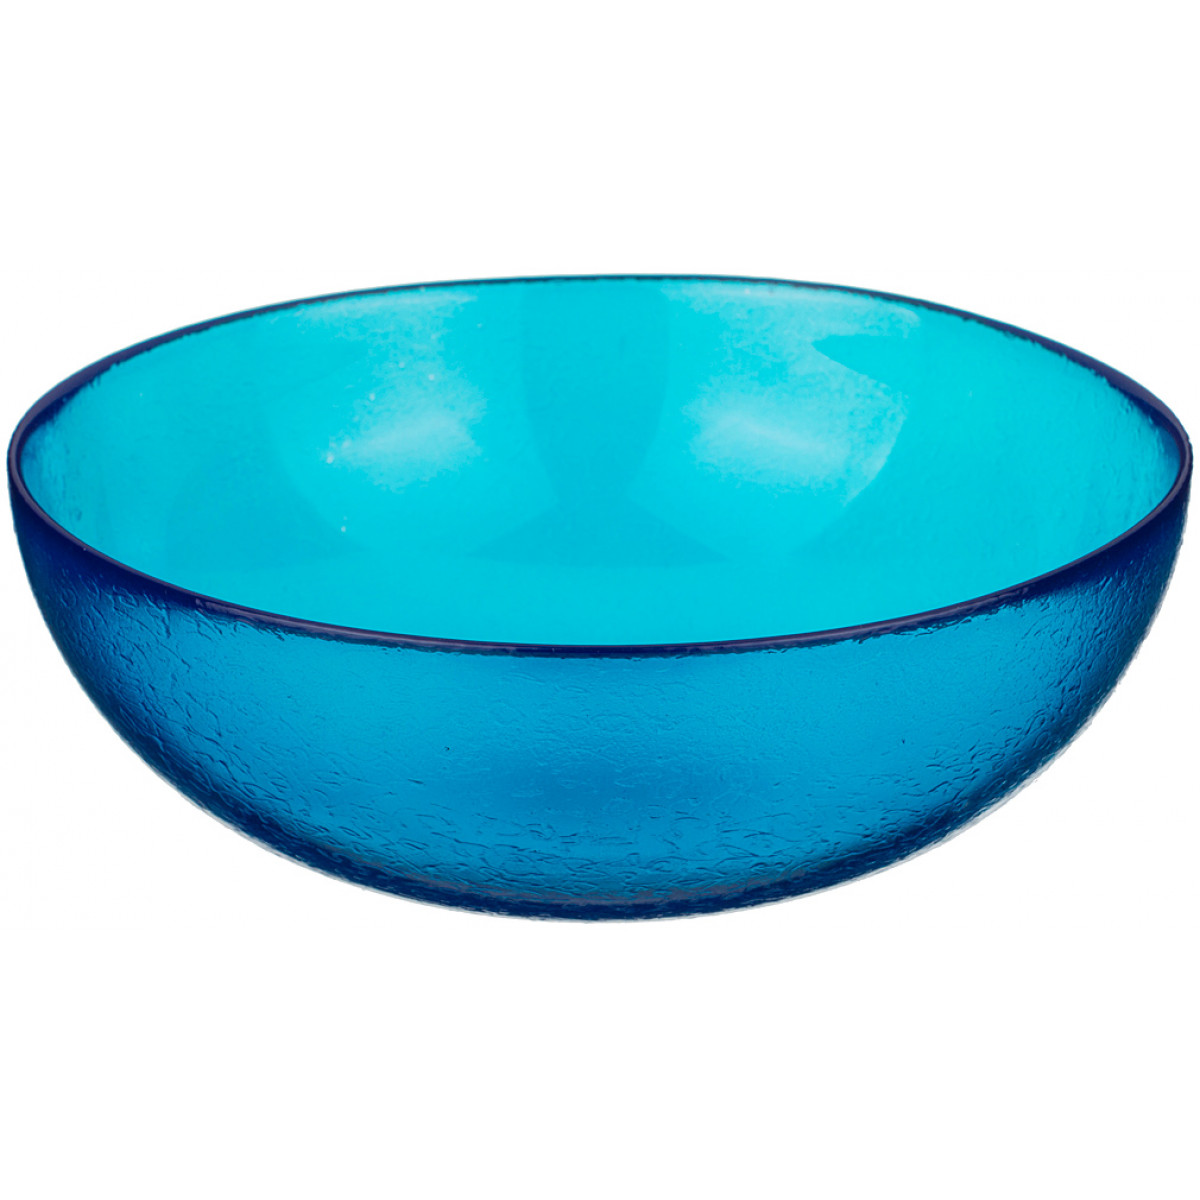 {} Arti-M Салатник Cagliari  (6х17 см) салатник гжельские узоры диаметр 17 5 см